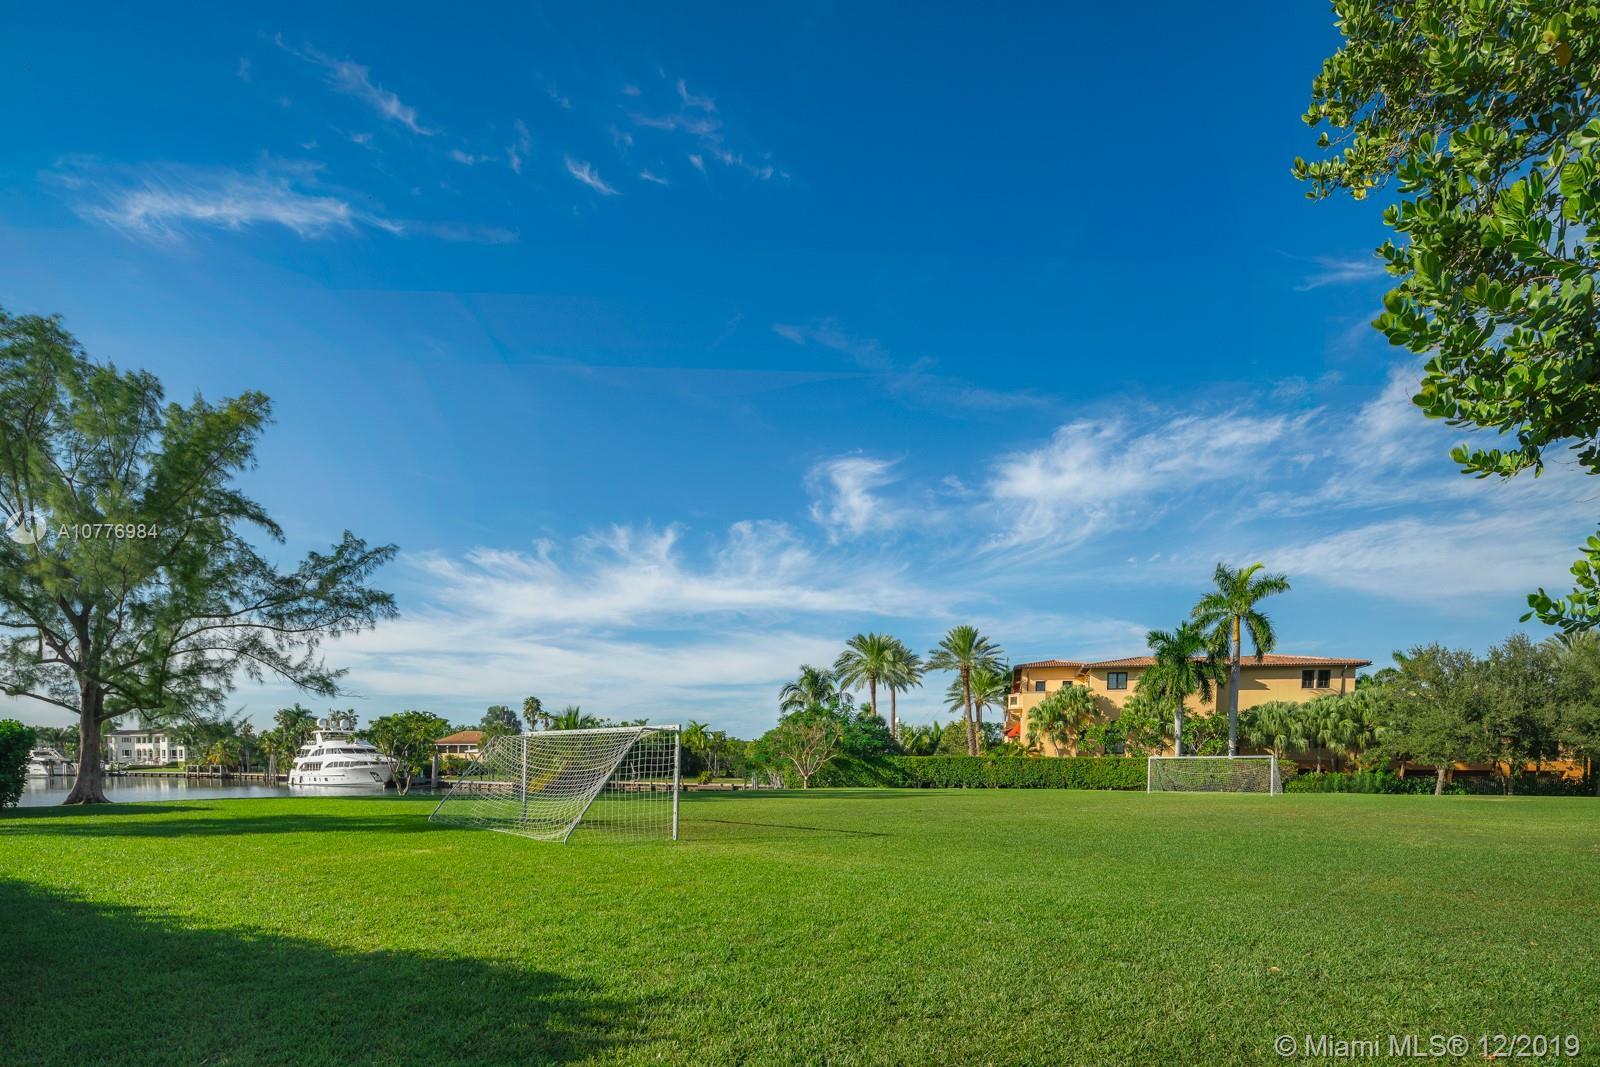 Дом в США по адресу 21 Casuarina Concourse, Coral Gables, FL 33143